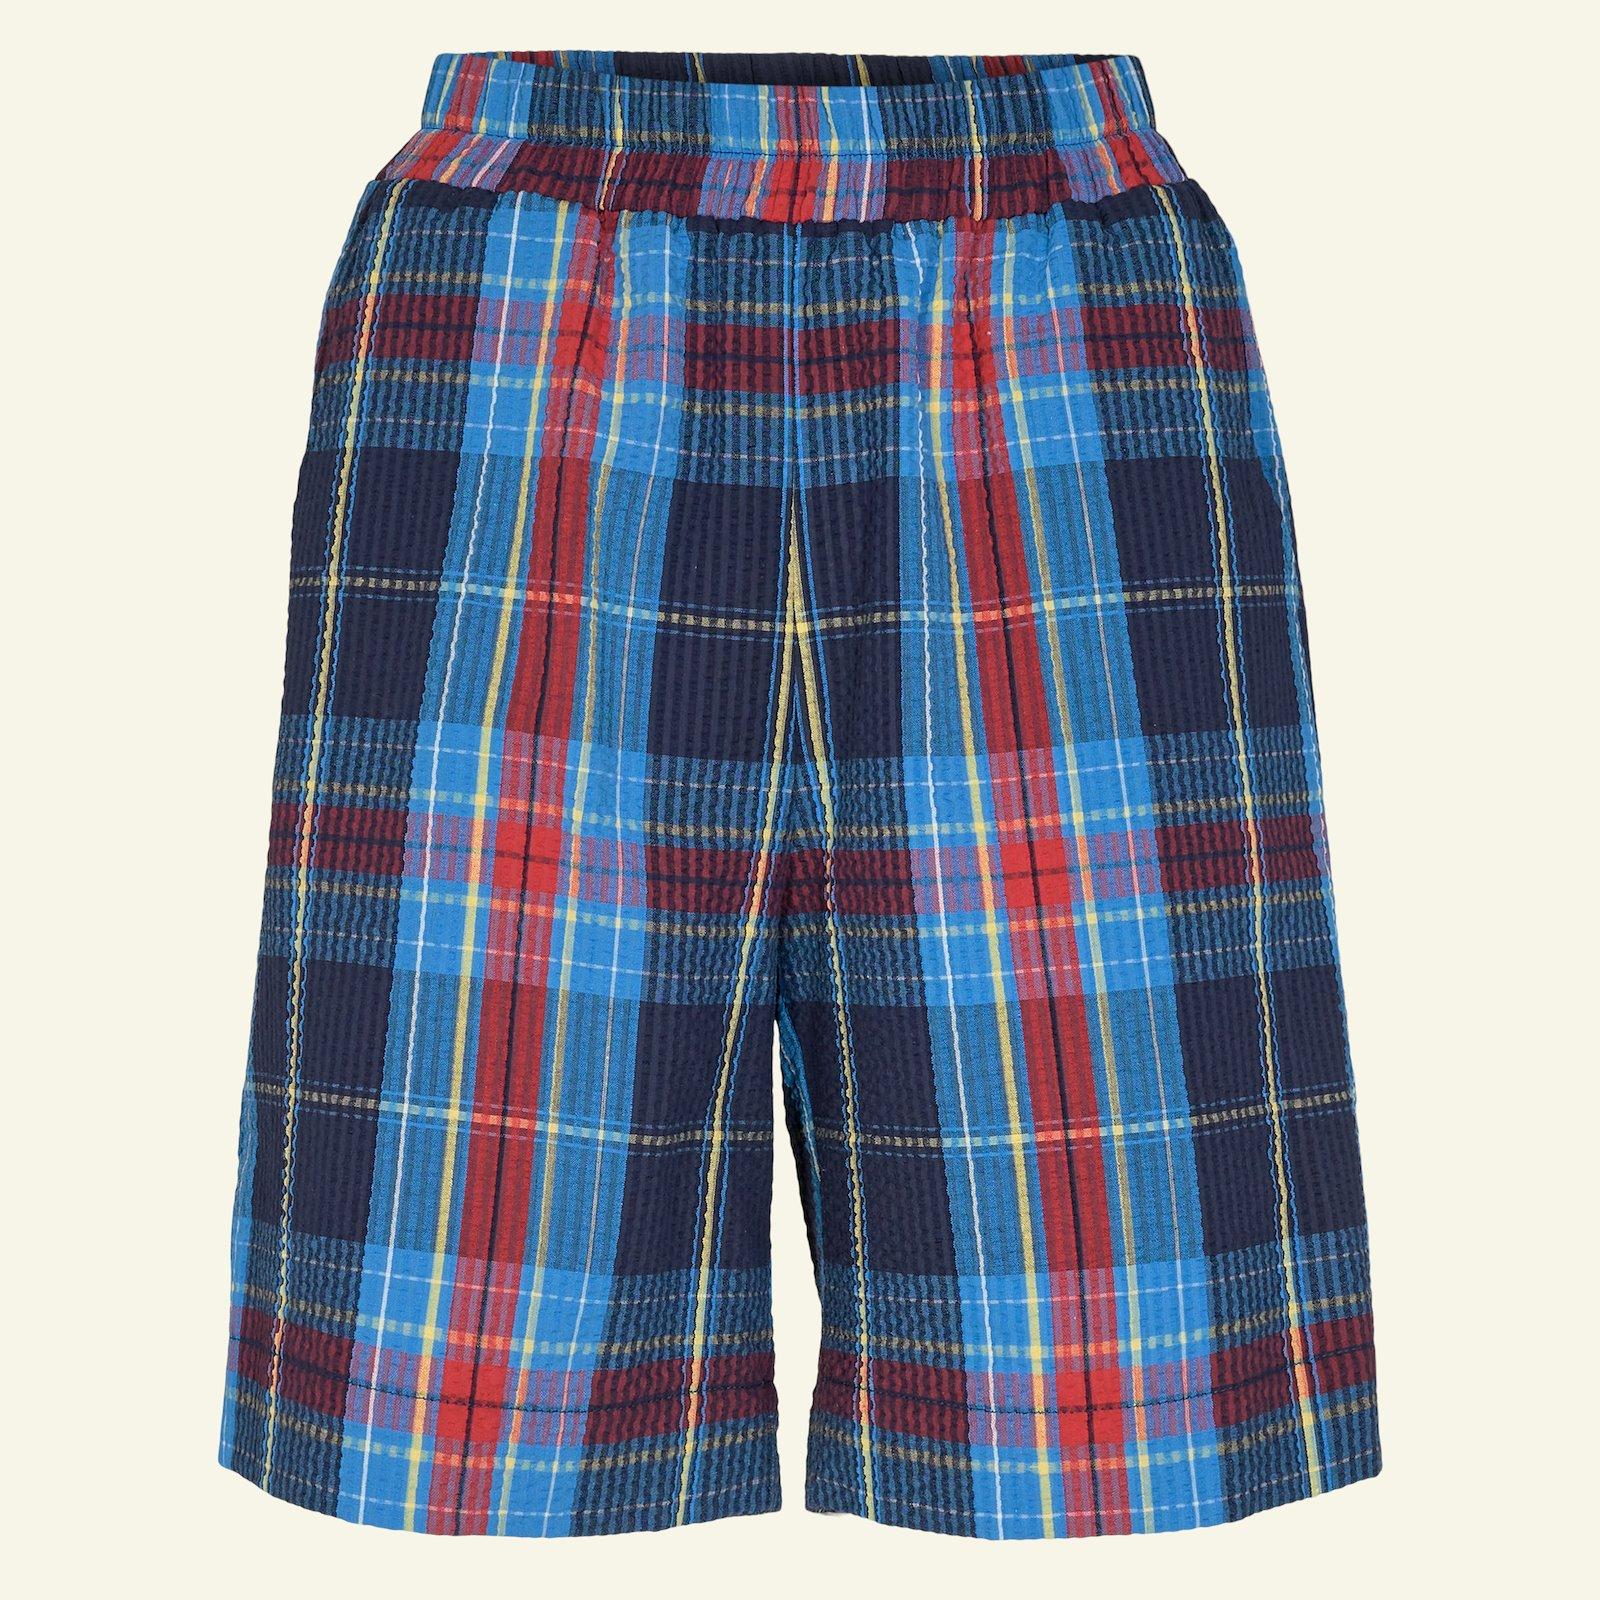 Seersucker blue/red yarn dyed check p20051_580053_sskit